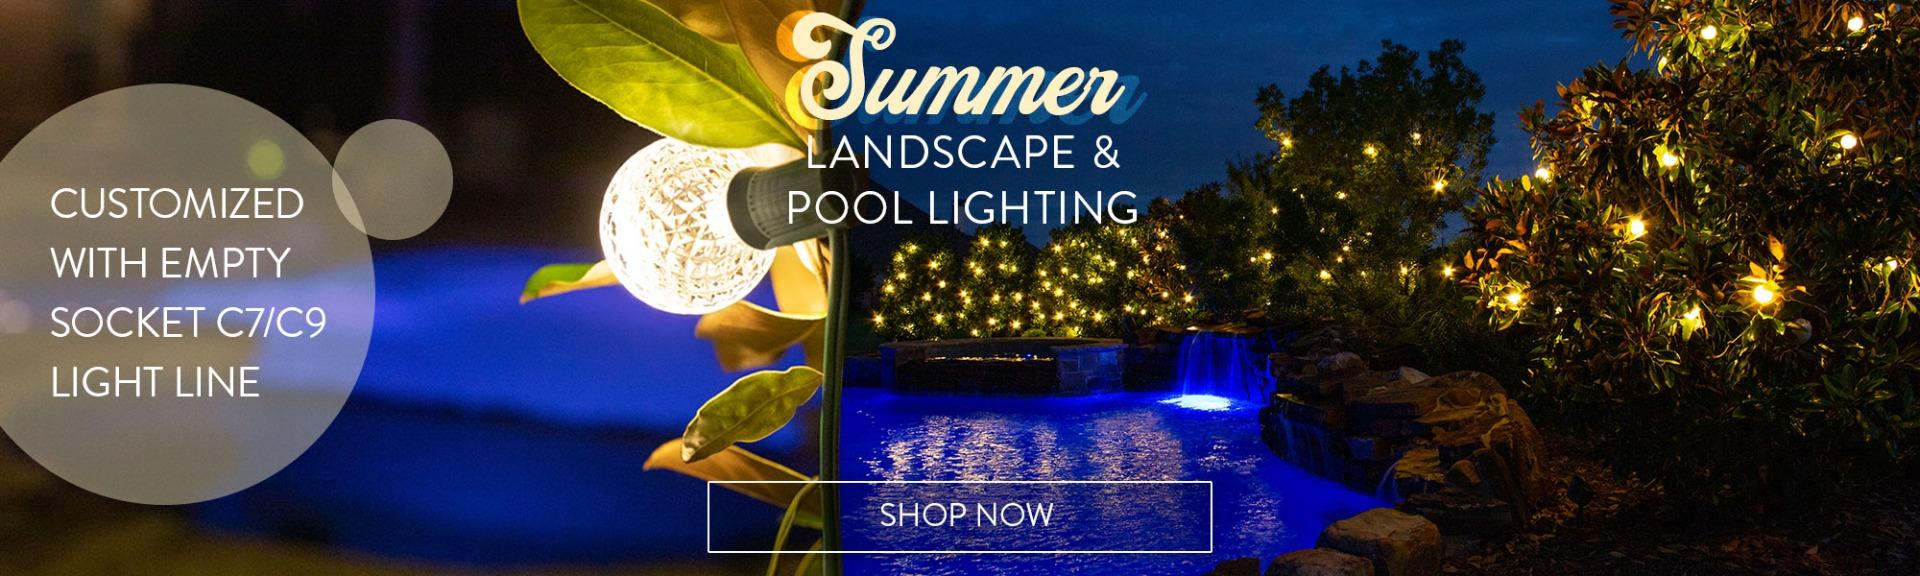 Summer Landscape and Pool Lighting